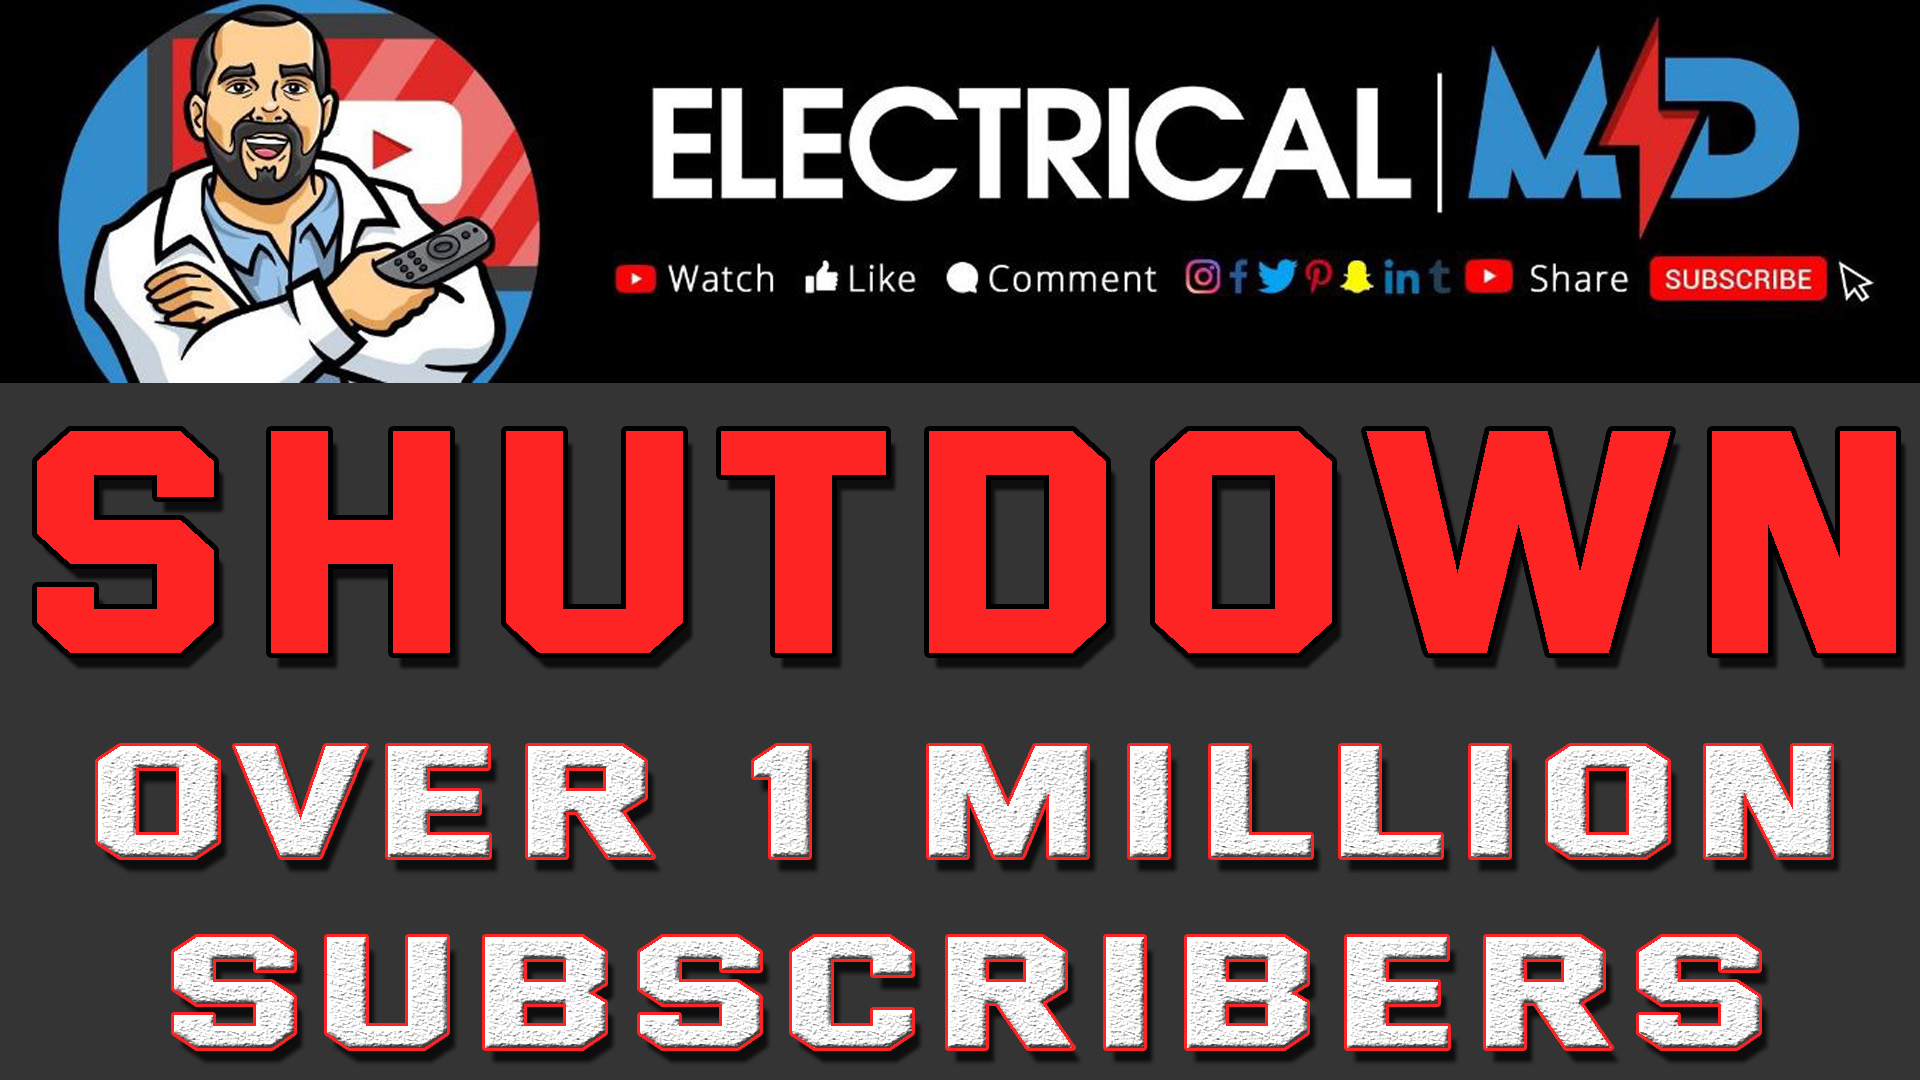 Electrical MD YouTube Shutdown